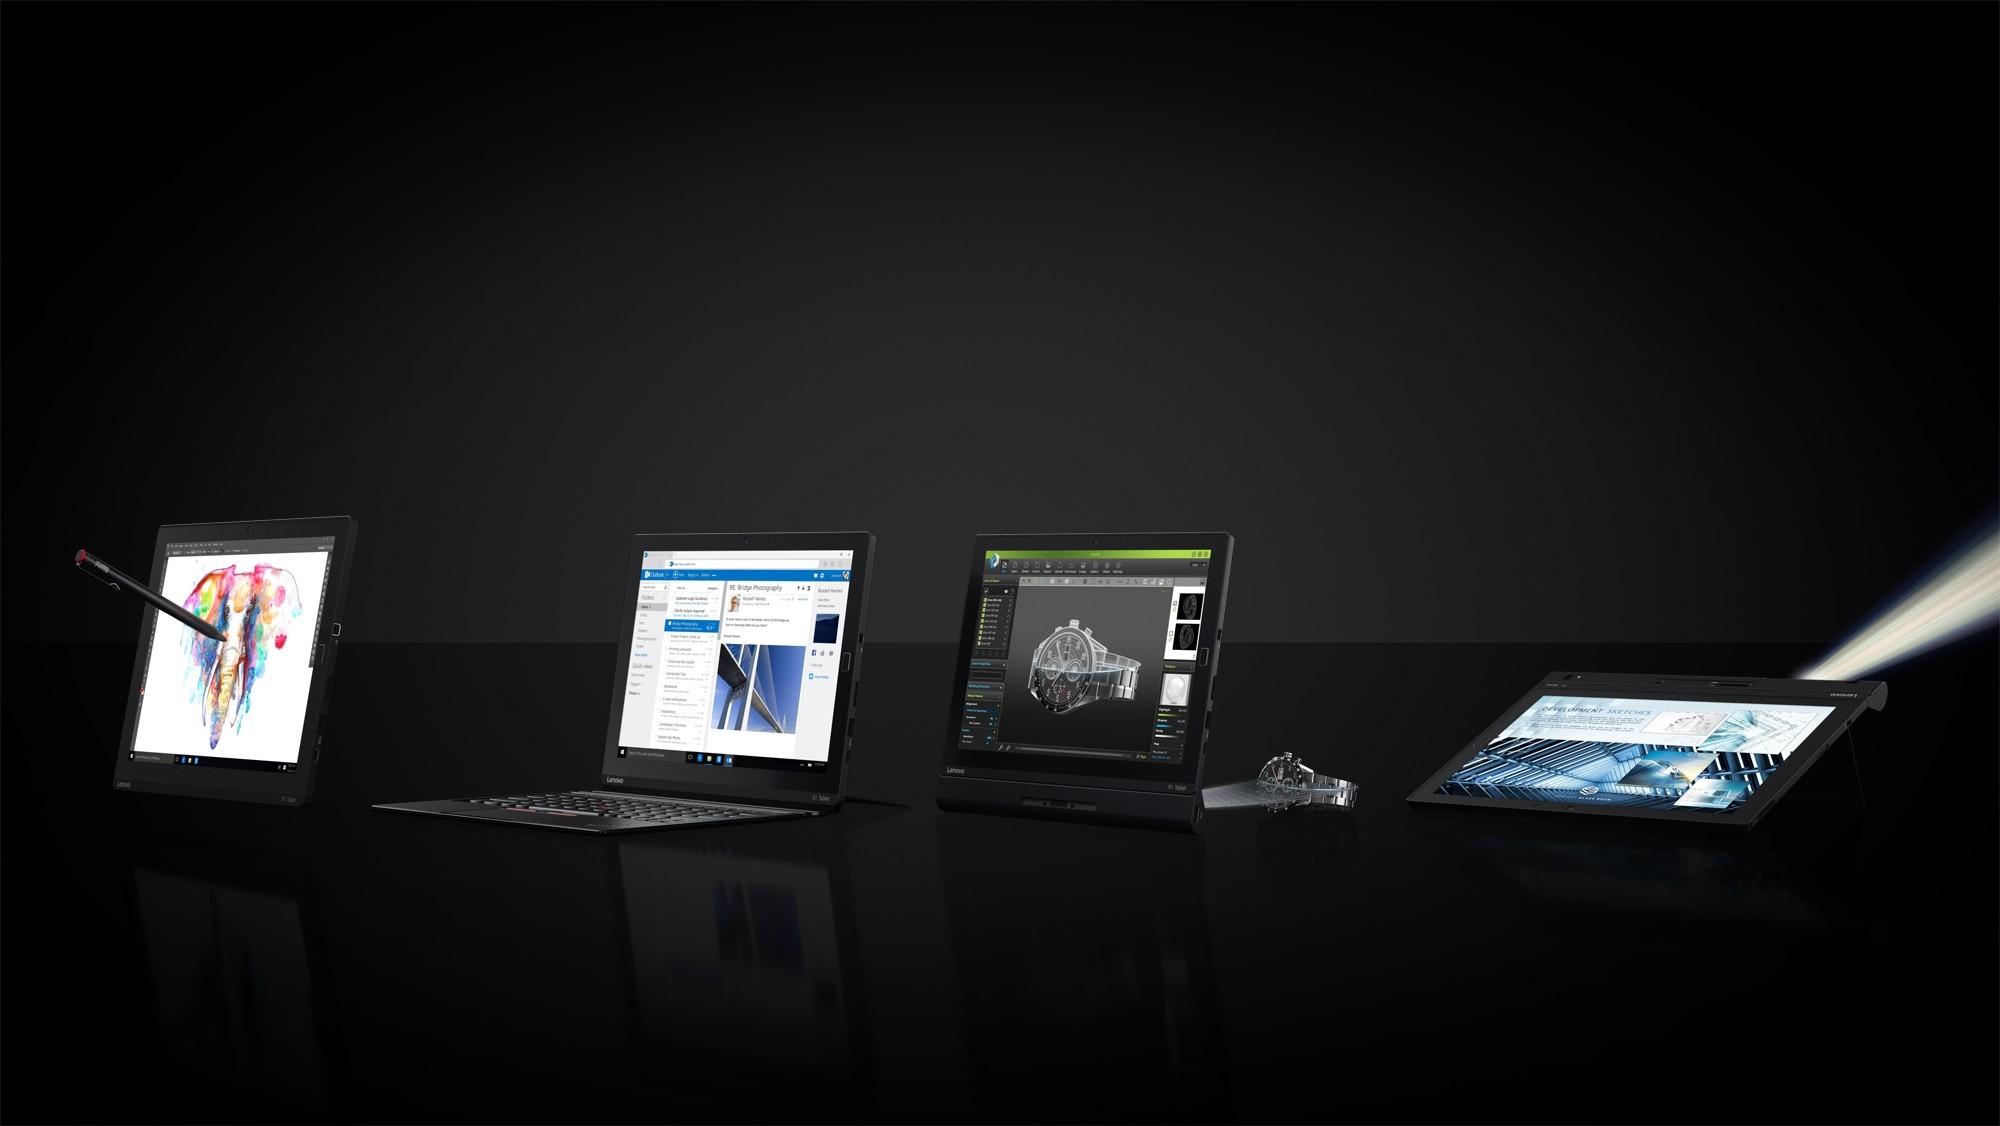 Lenovo introduces the Thinkpad X1 modular tablet with